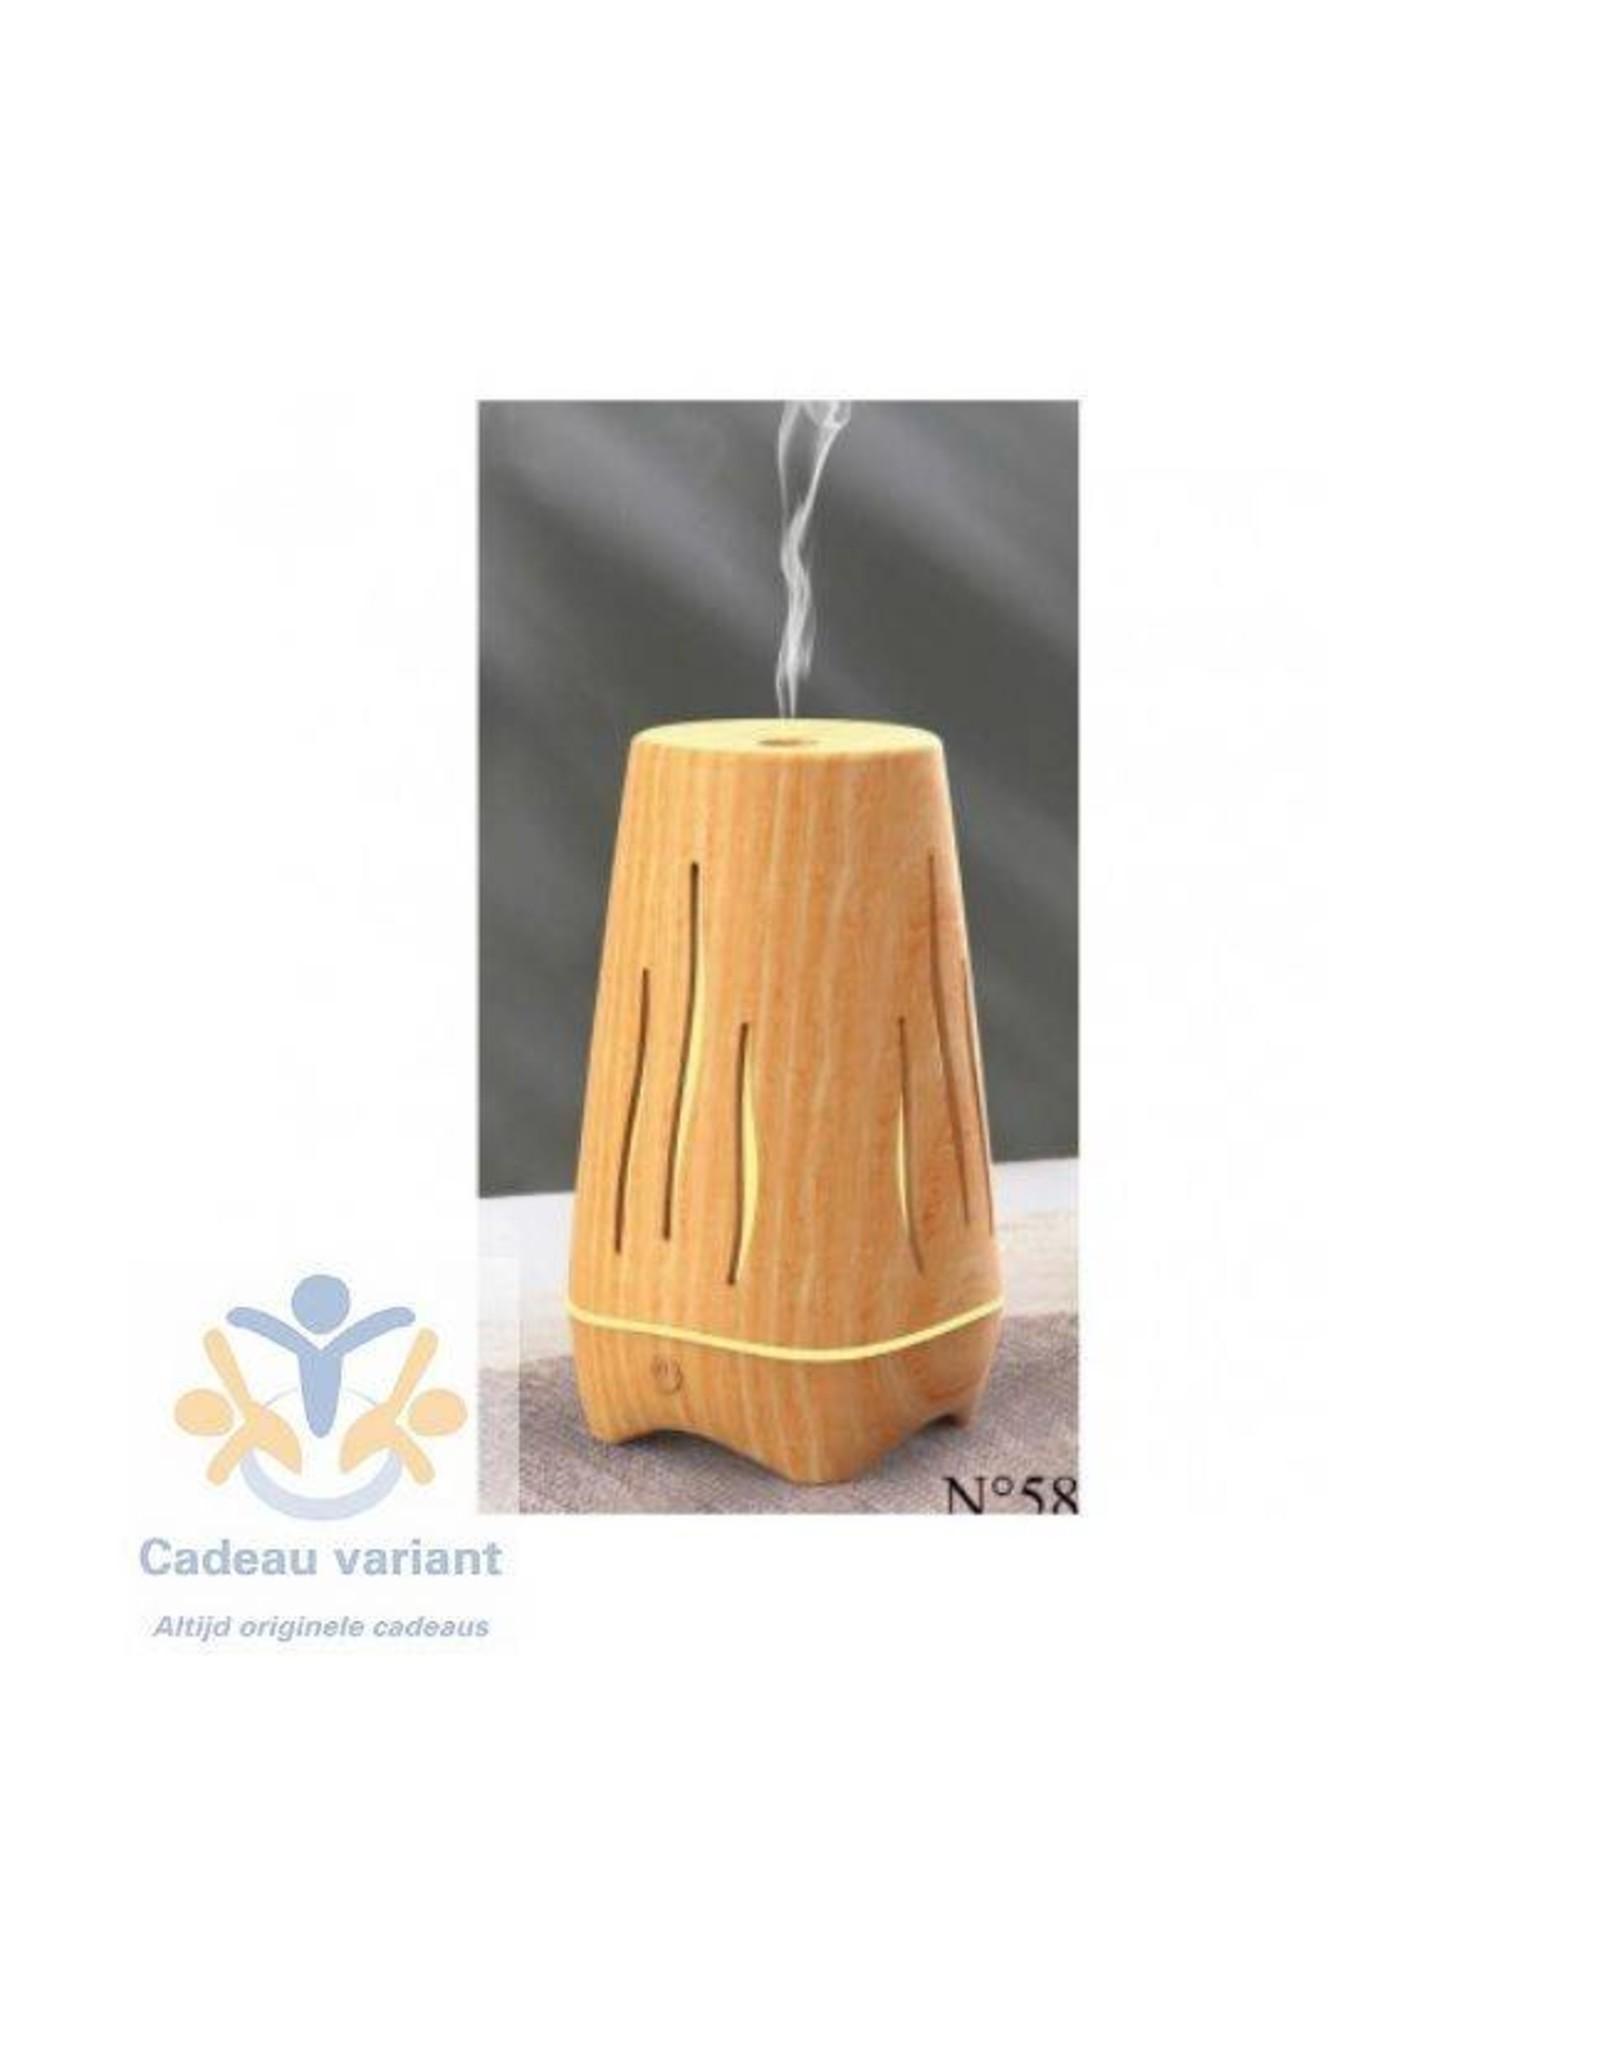 Ultransmit diffusers Aroma diffuser Zoë 130 ml